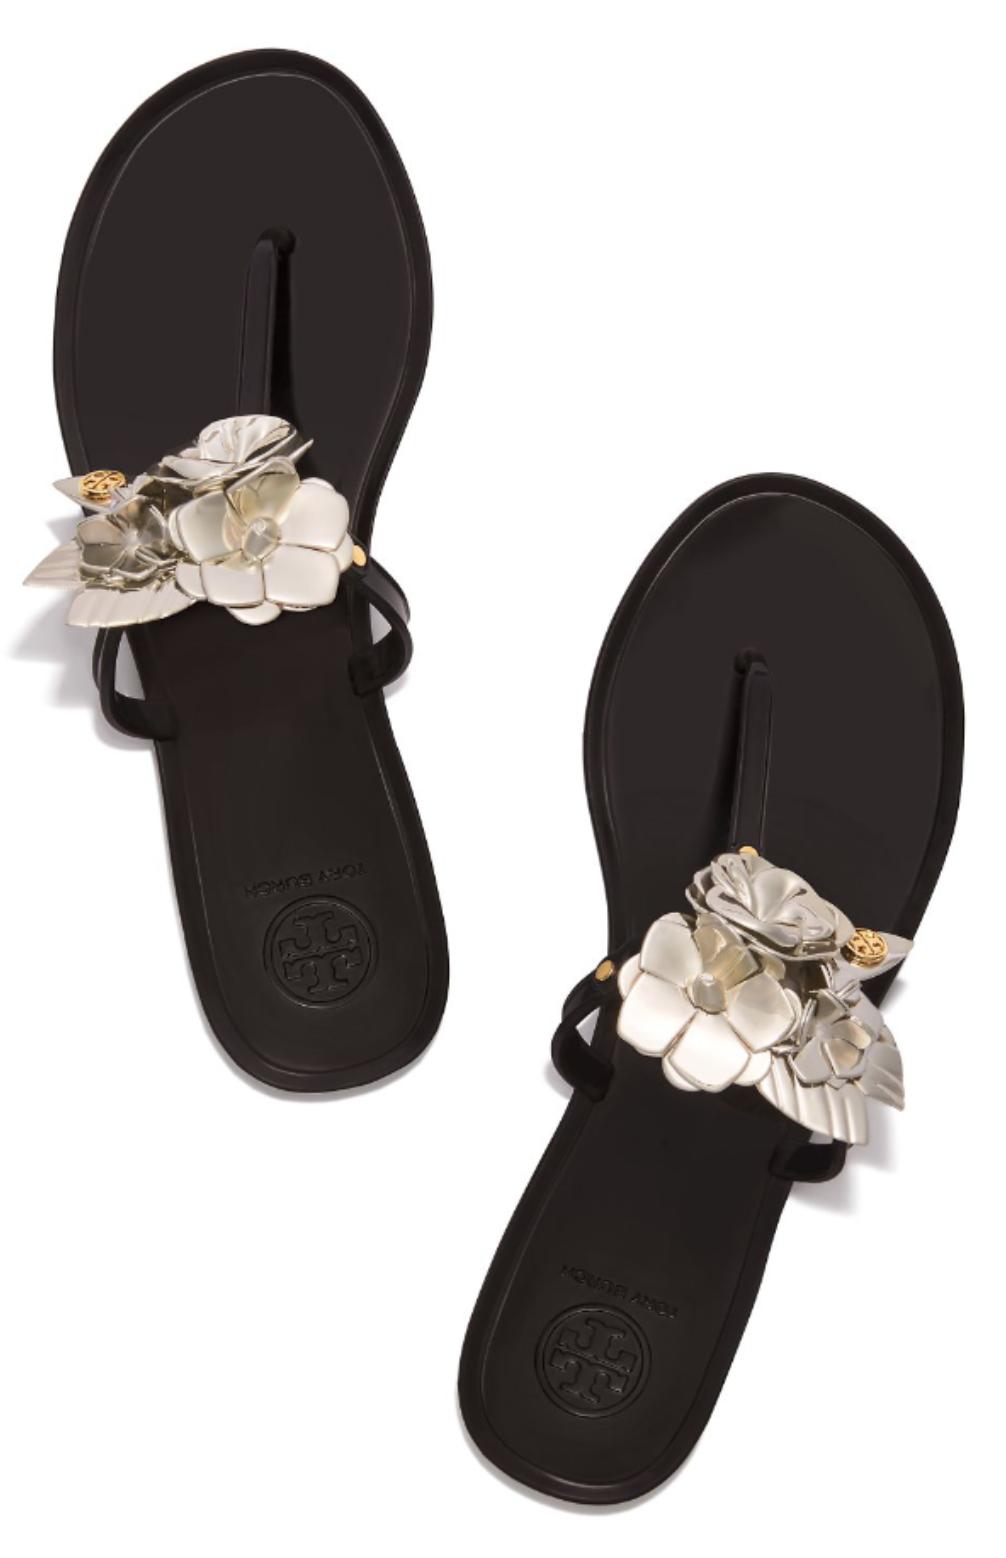 b9251dbf1 Tory Burch Blossom Jelly Thong Sandal